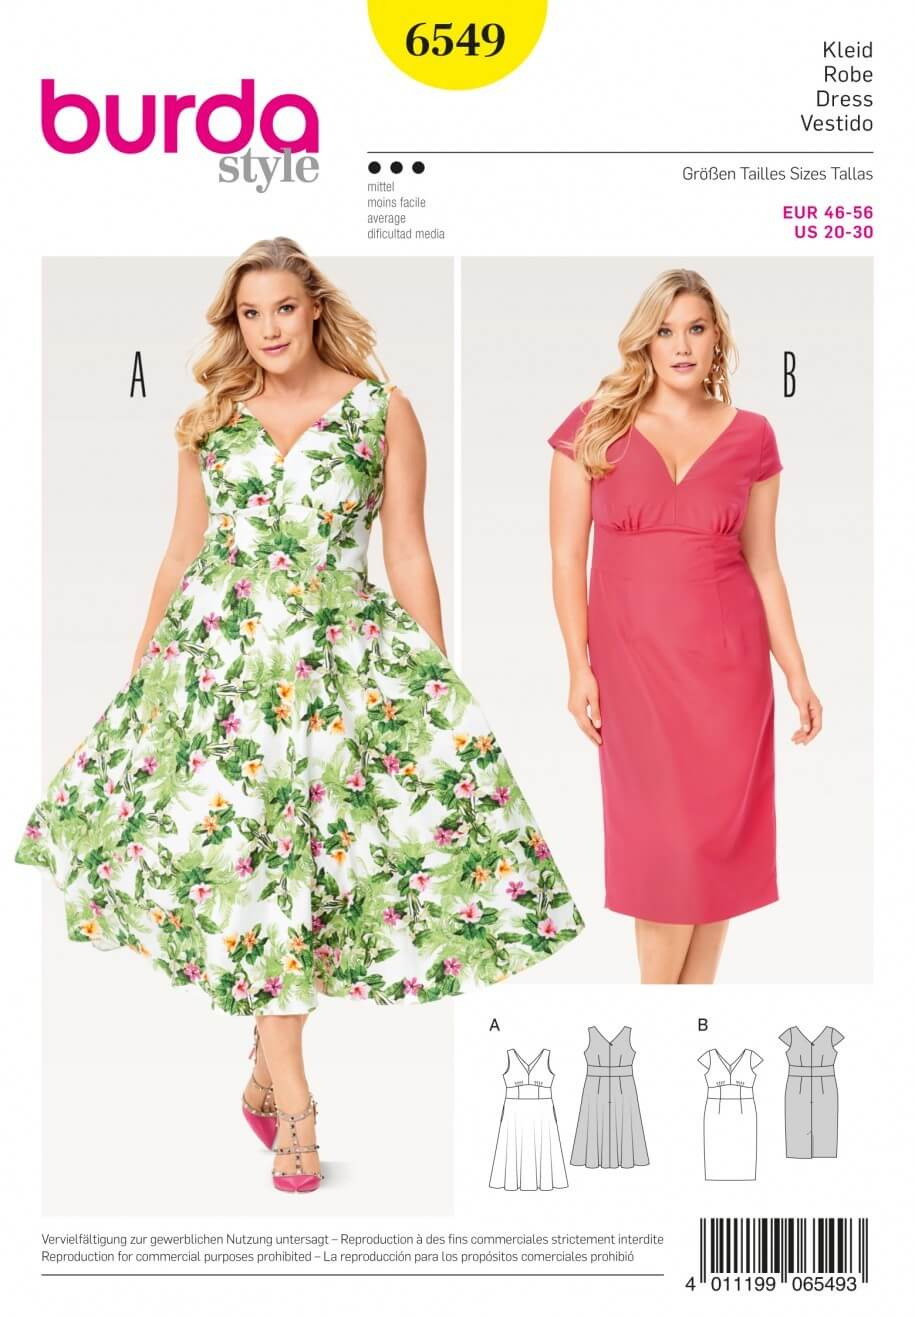 Burda Style Misses Short Sleeve Summer Dress Sewing Pattern 6549